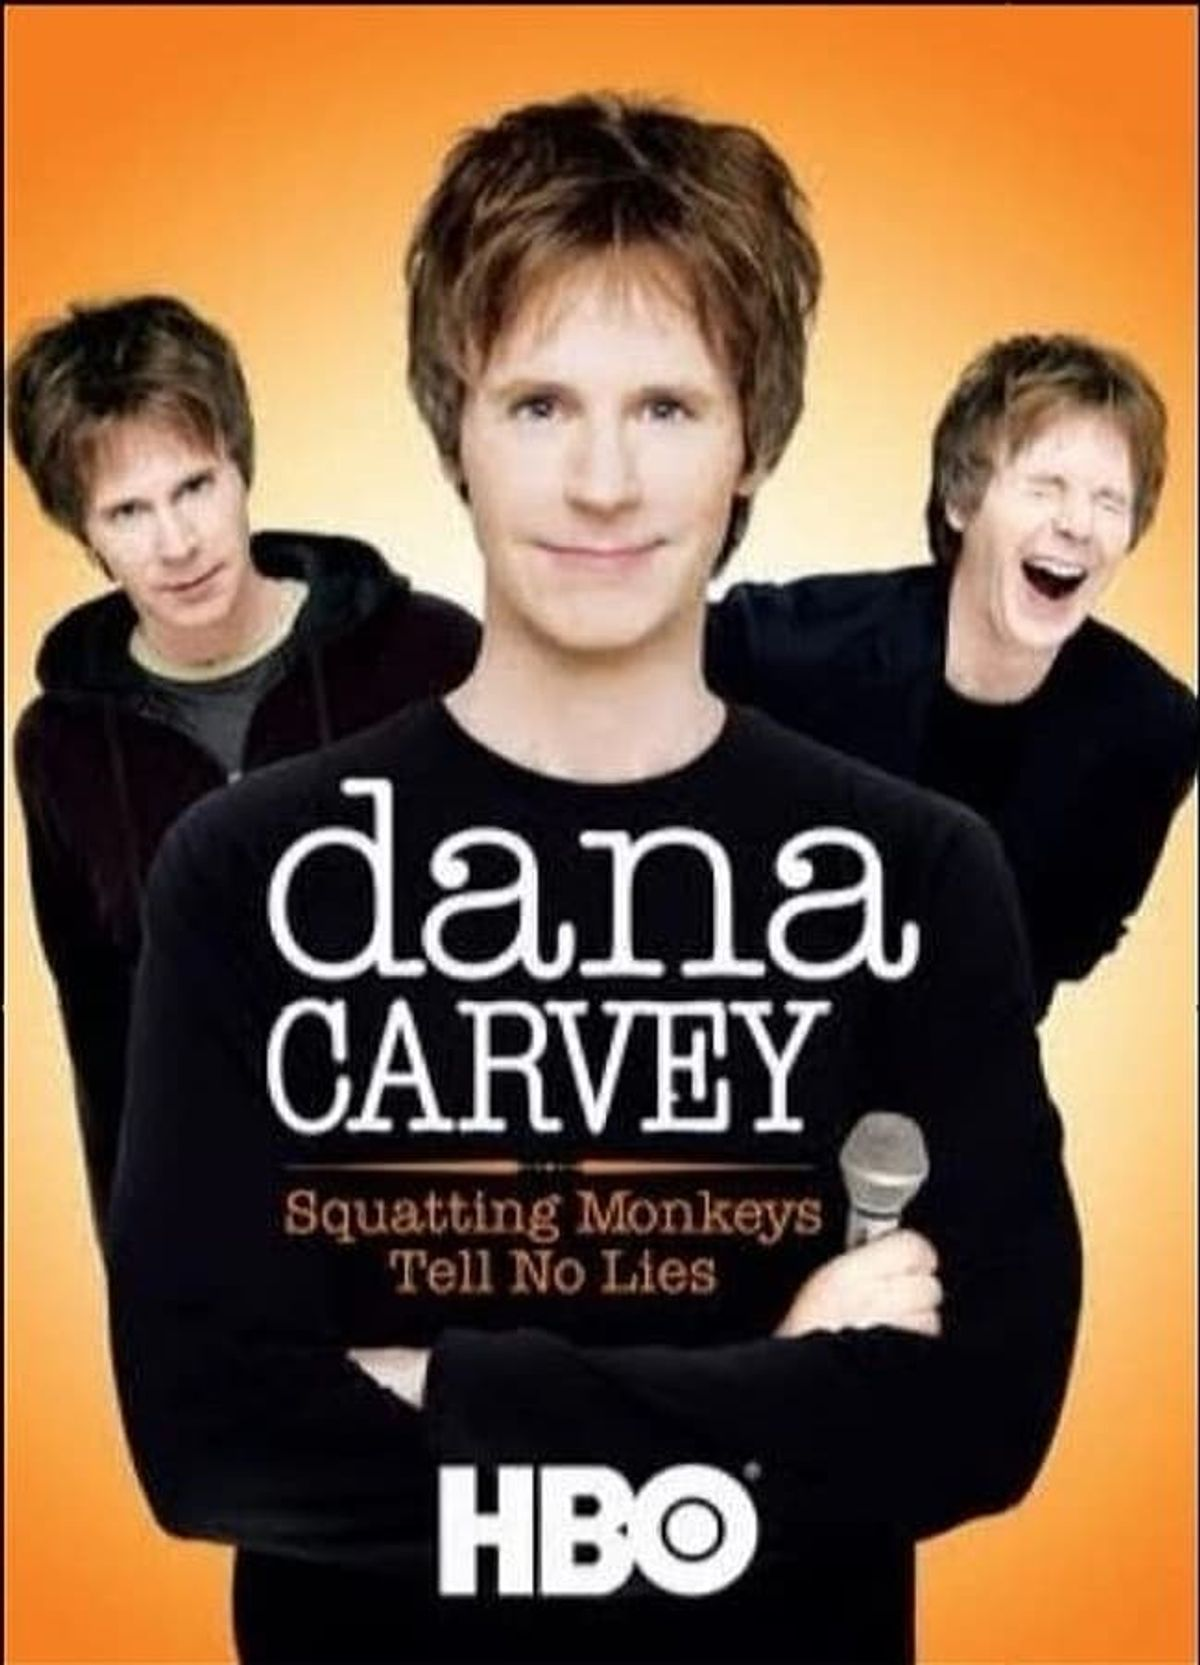 Dana Carvey: Squatting Monkeys Tell No Lies